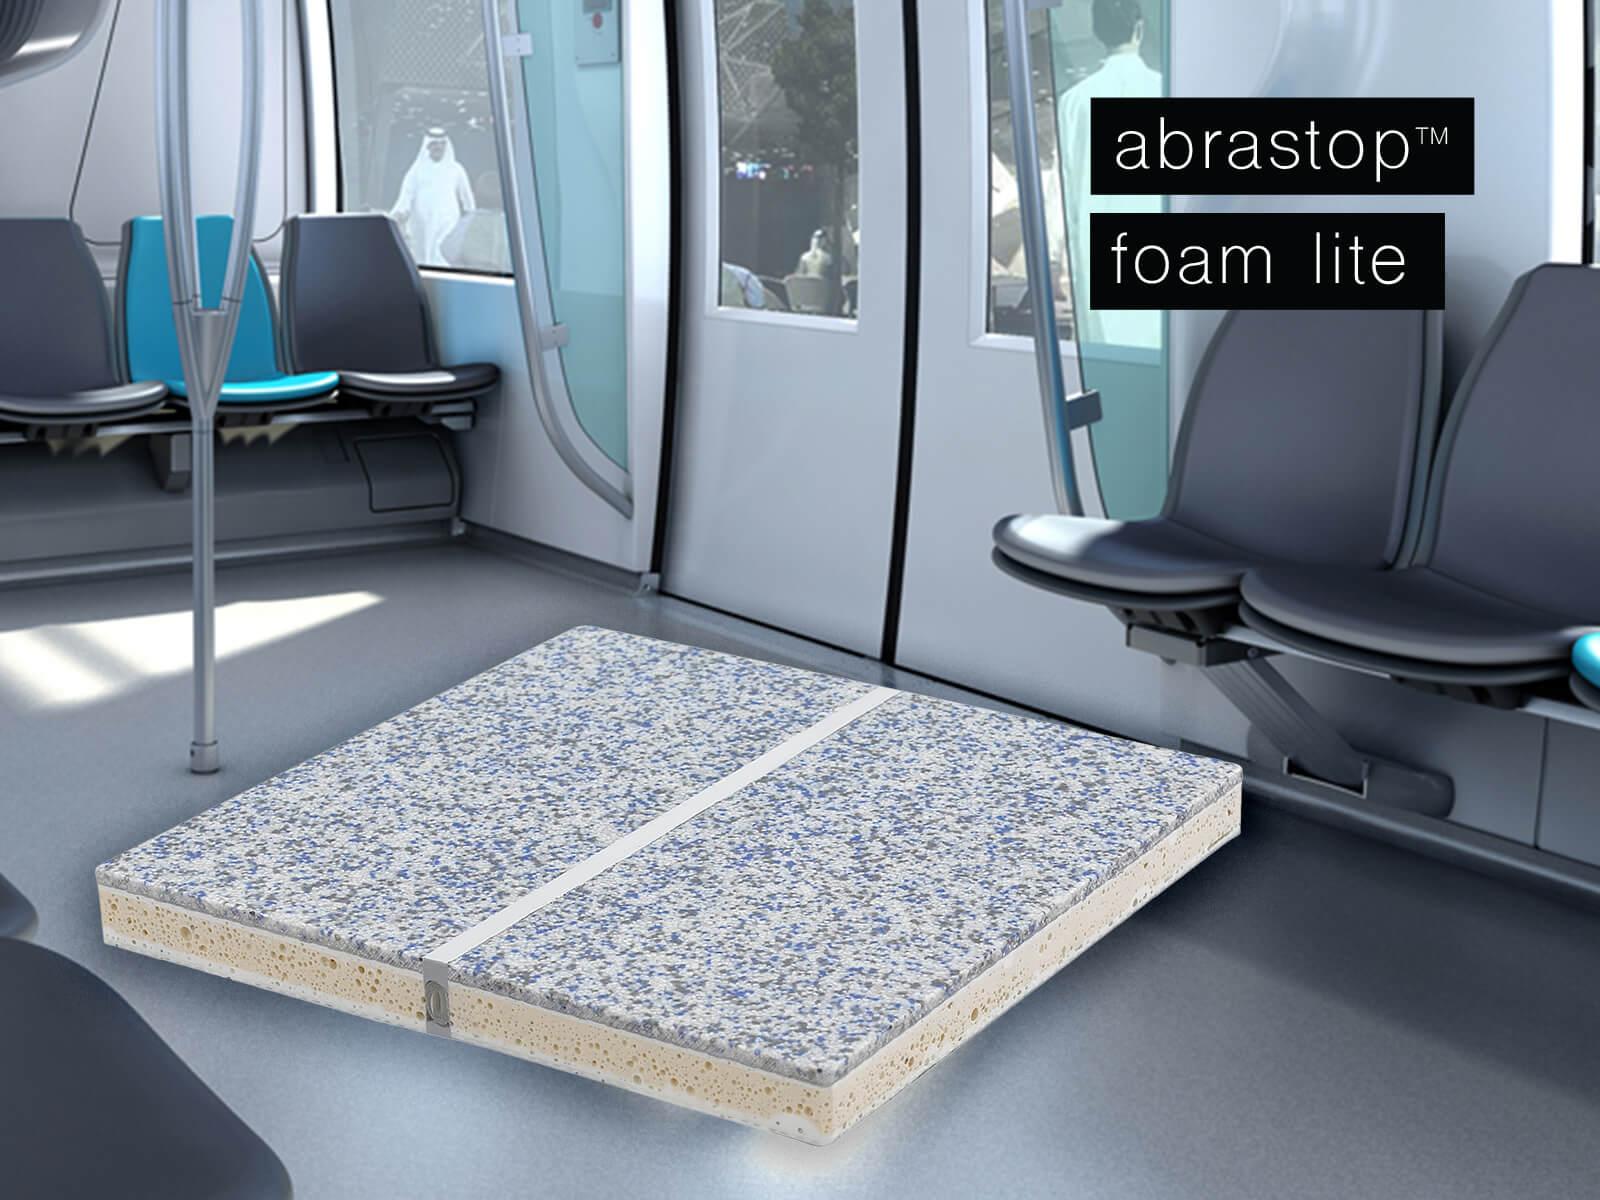 Baultar's Abrastop™ Foam Lite